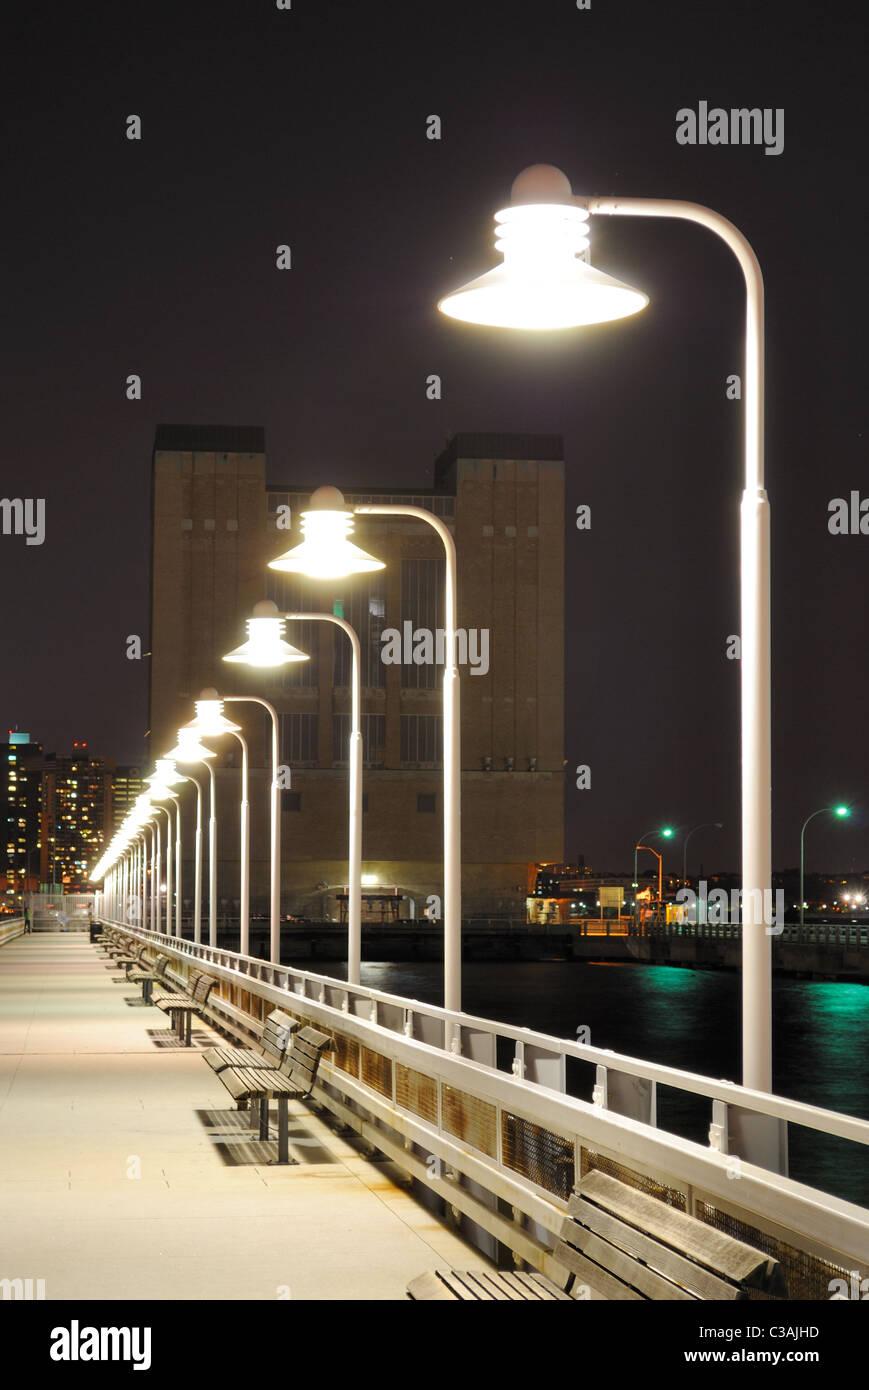 Largo muelle con luces en la distancia. Imagen De Stock